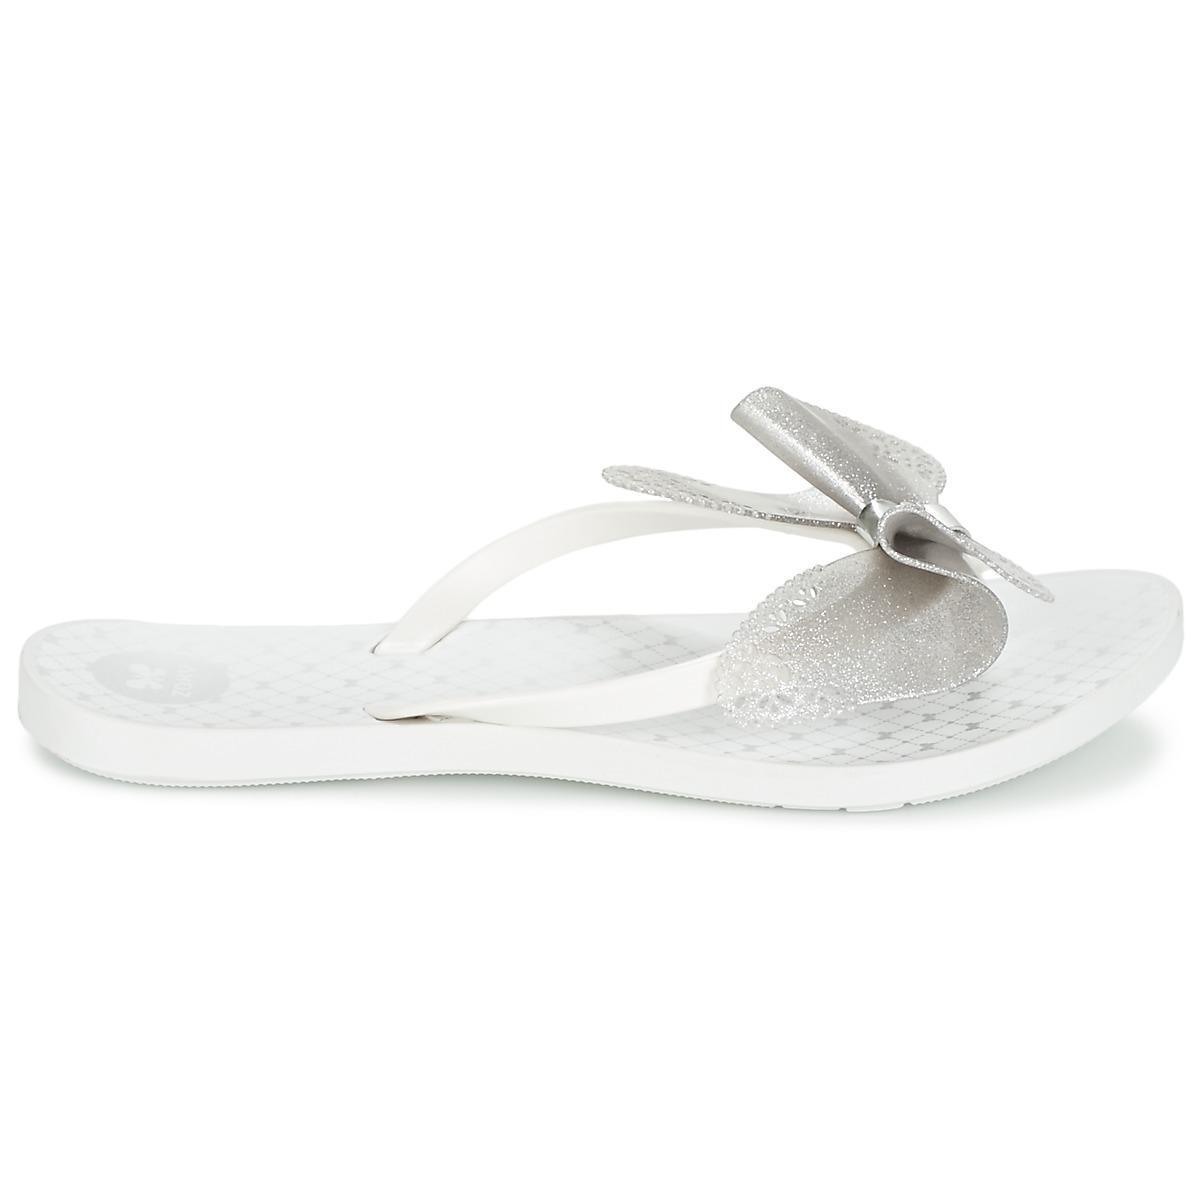 5464bd8abbf26f Zaxy - White Fresh Butterfly Flip Flops   Sandals (shoes) - Lyst. View  fullscreen